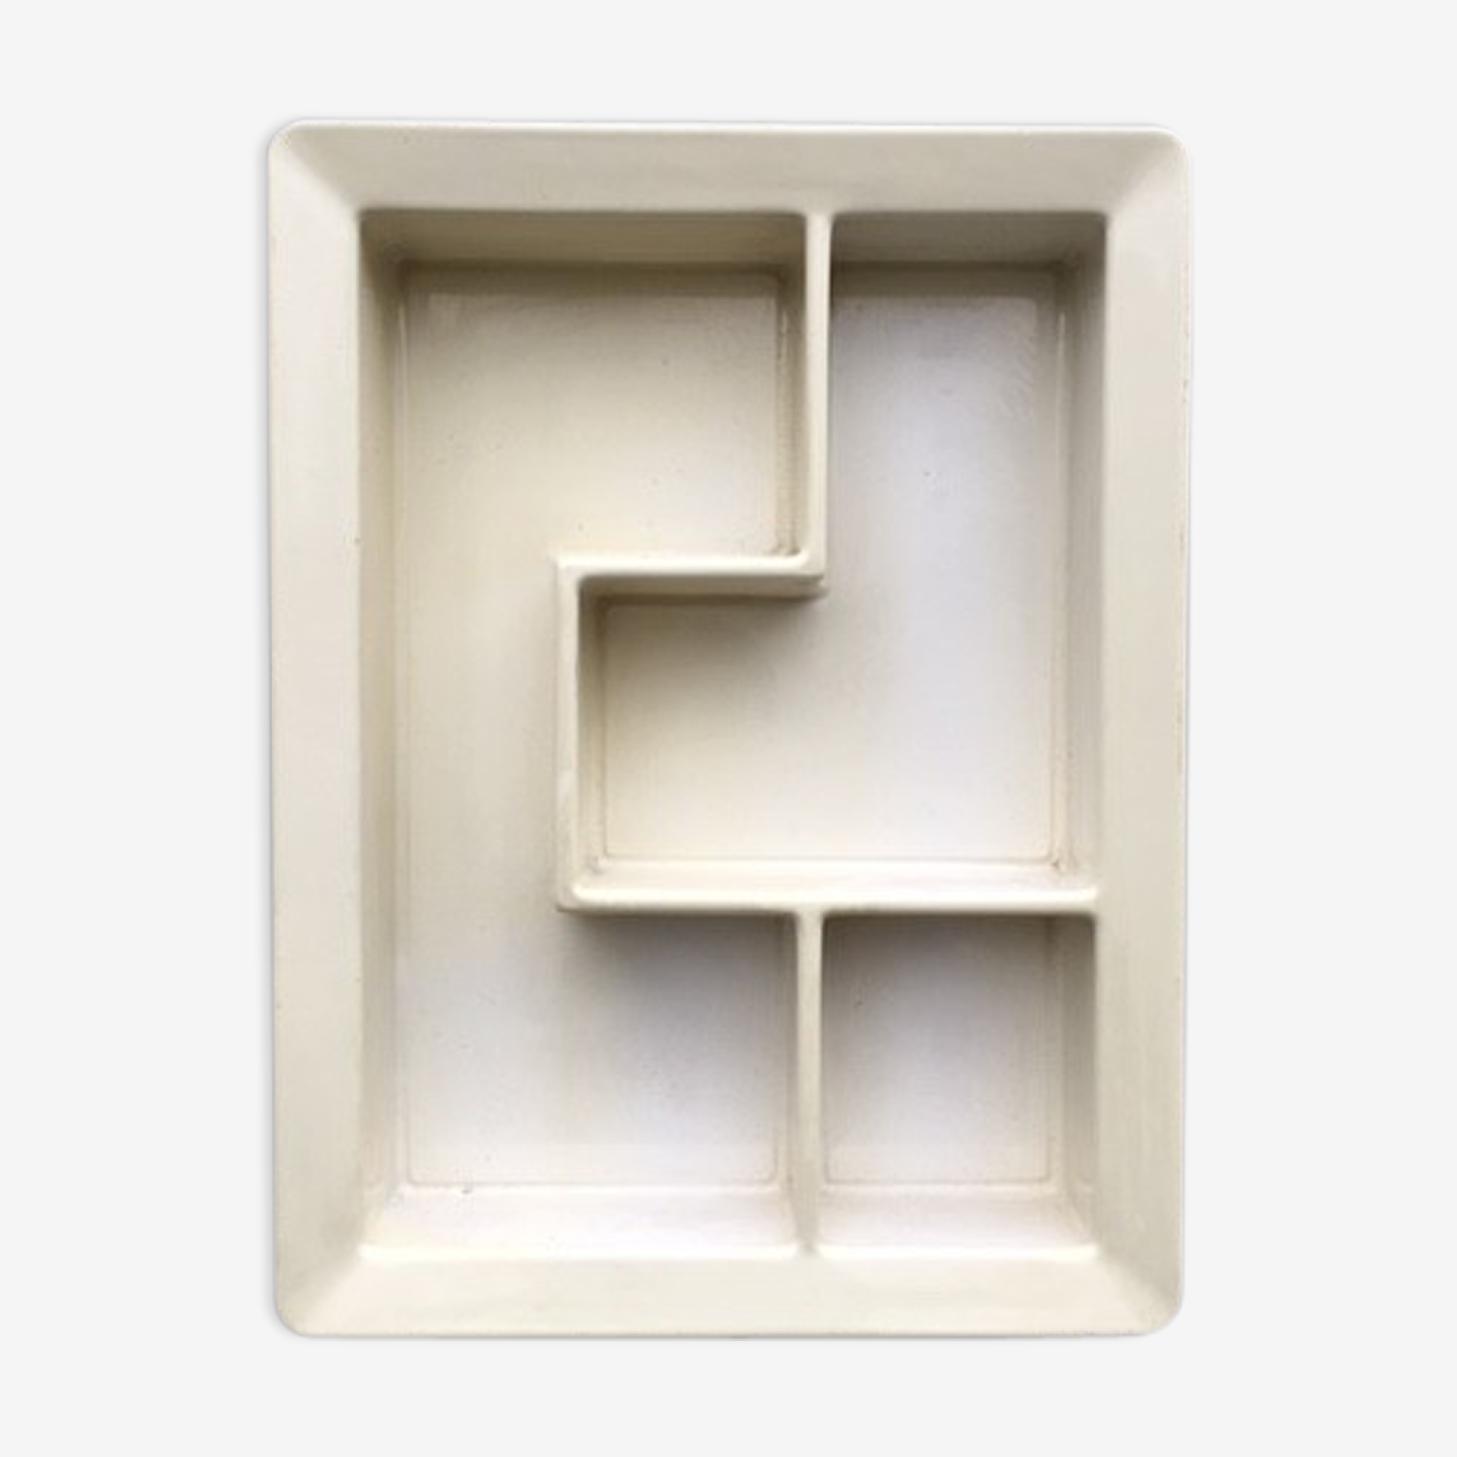 J boy ed Formag design shelf